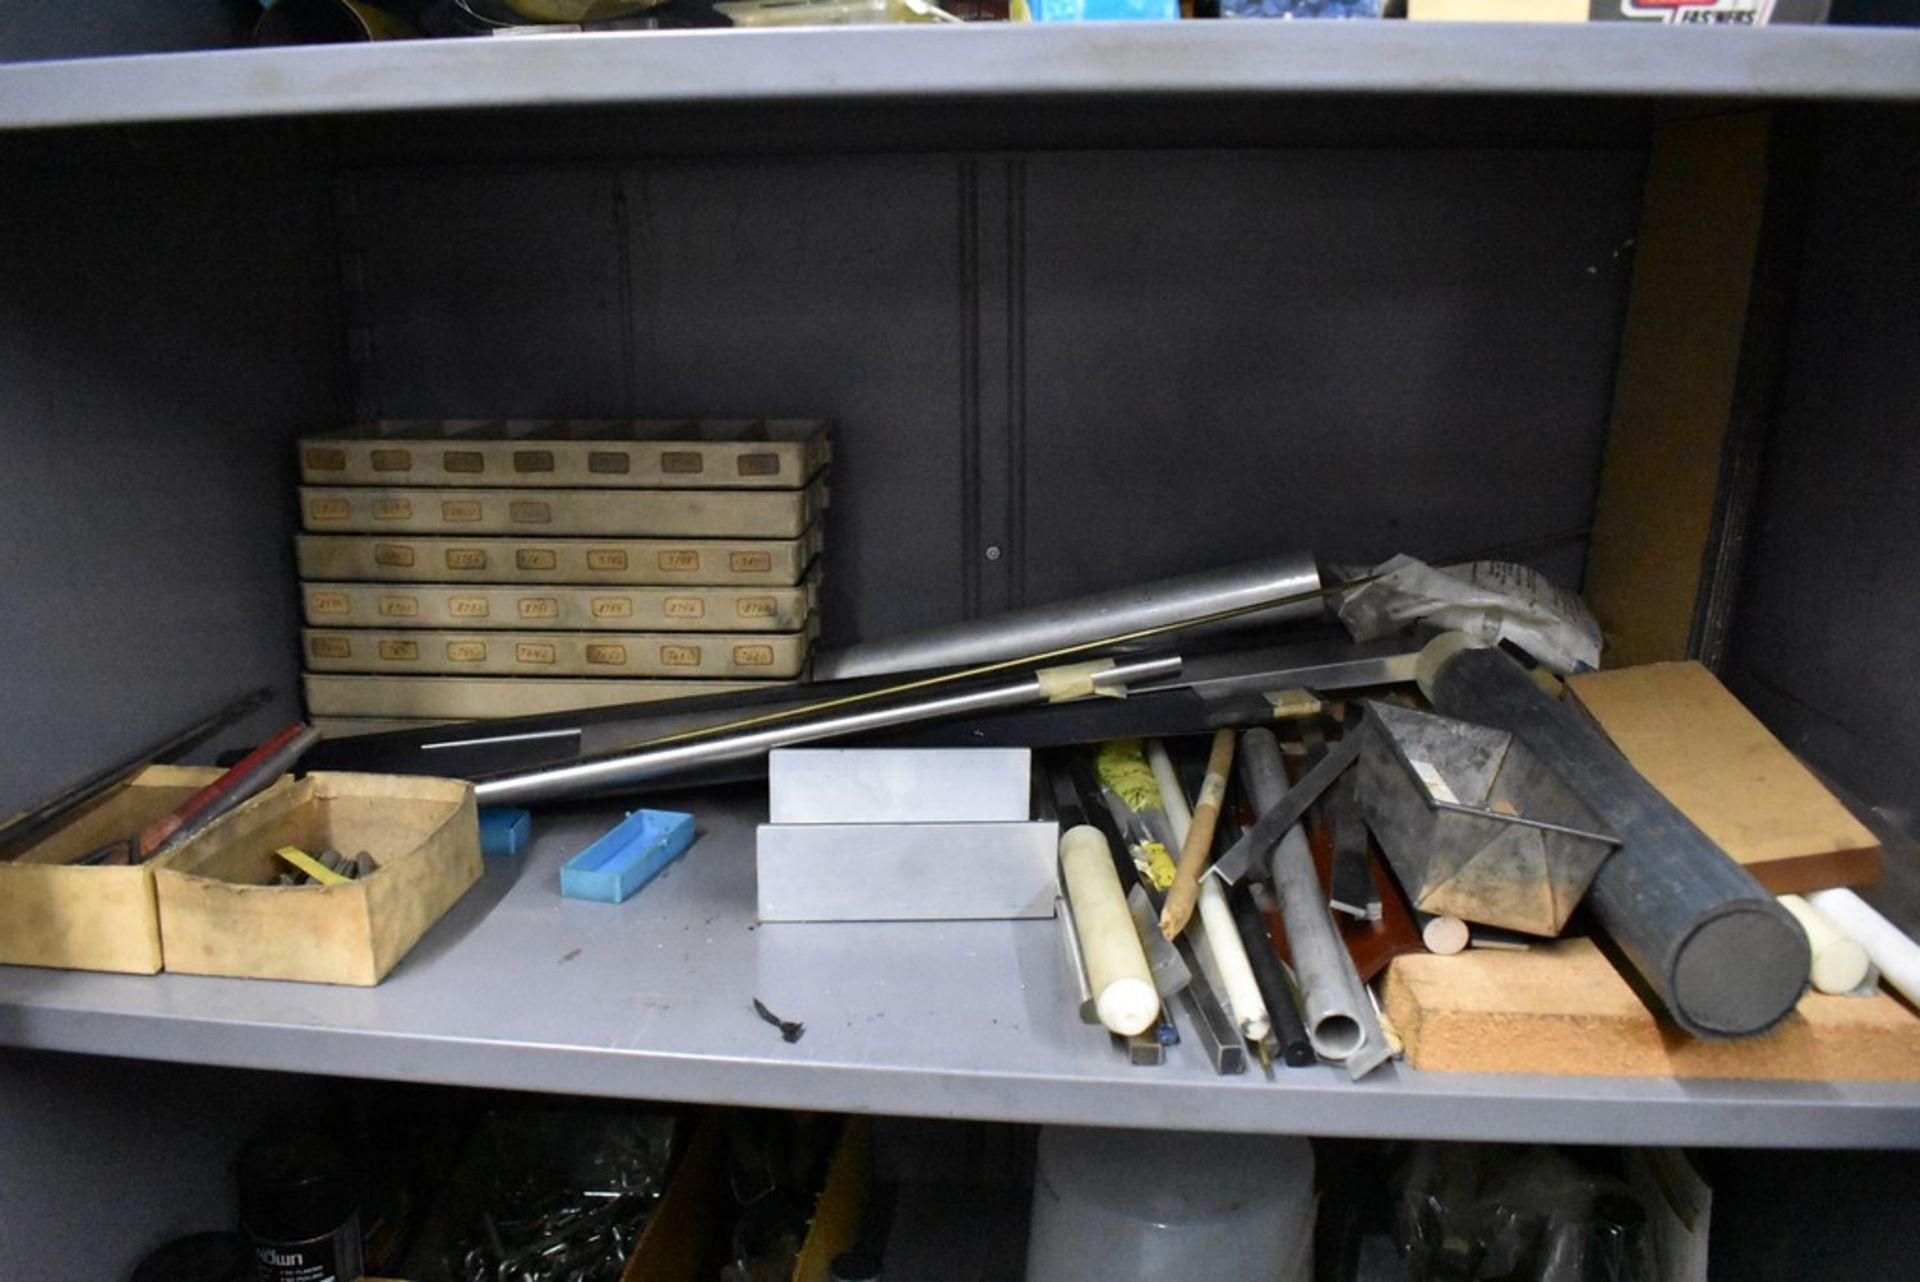 HOBART THIRTEEN DRAWER STEEL TOOL CABINET - Image 6 of 10